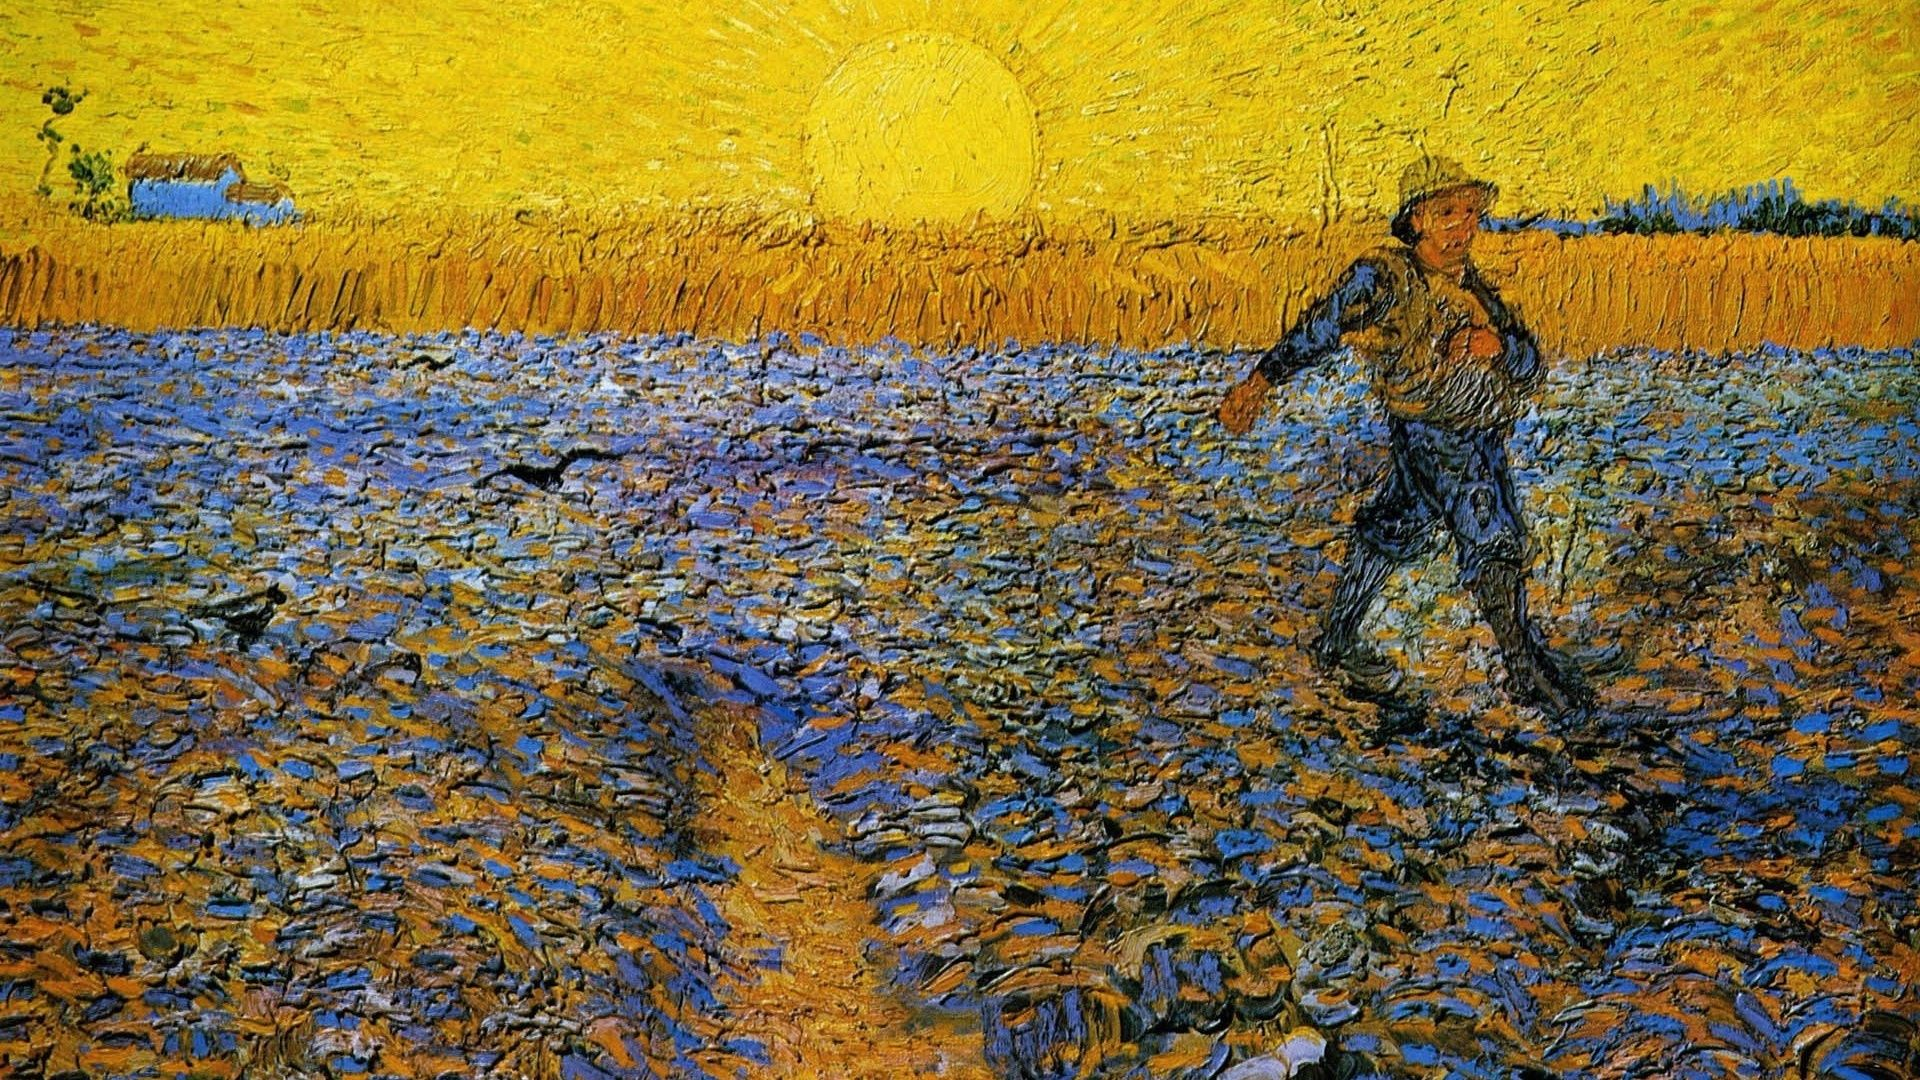 Van Gogh, Postimpressionism, Vincent, Van Gogh, Van Gogh The Sower Artwor